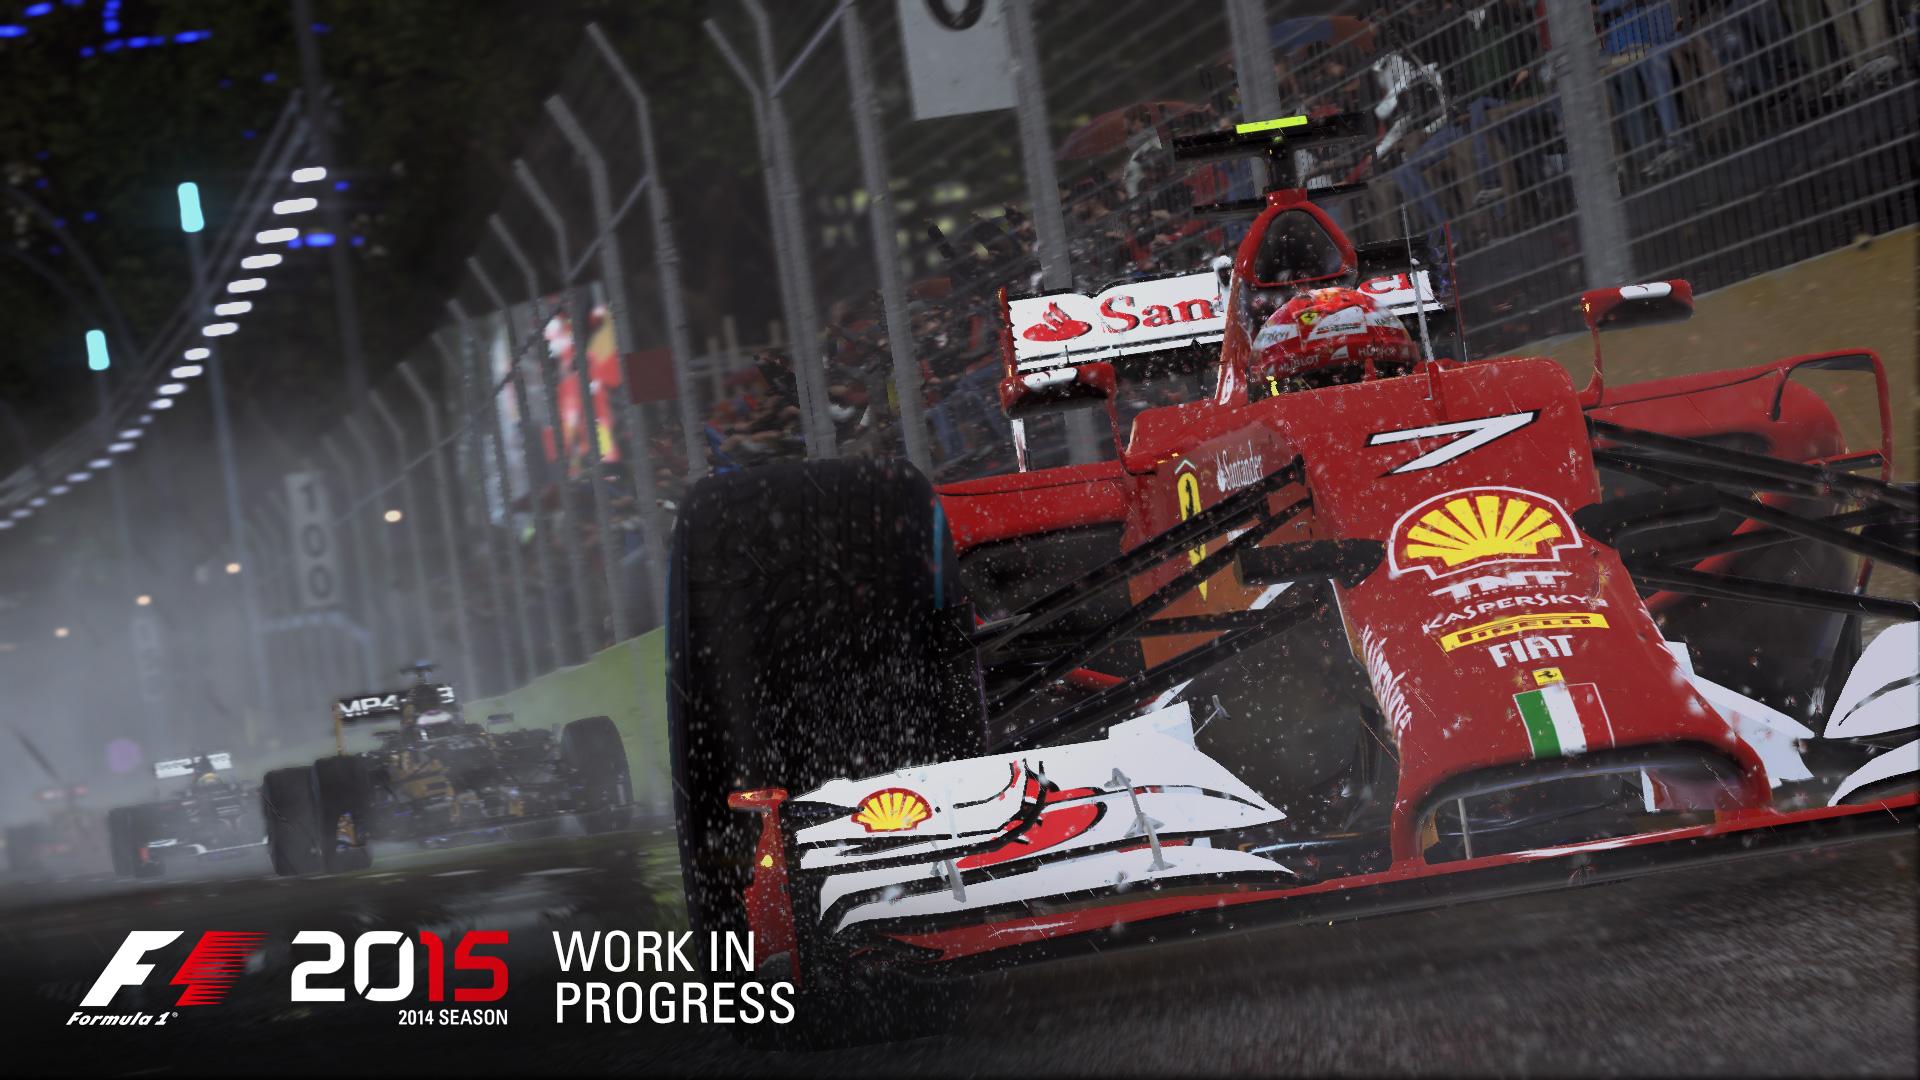 F1 2015 ESPAÑOL PC Full (CPY) + UPDATE v1.0.19.5154 + REPACK 2 DVD5 (JPW) 6